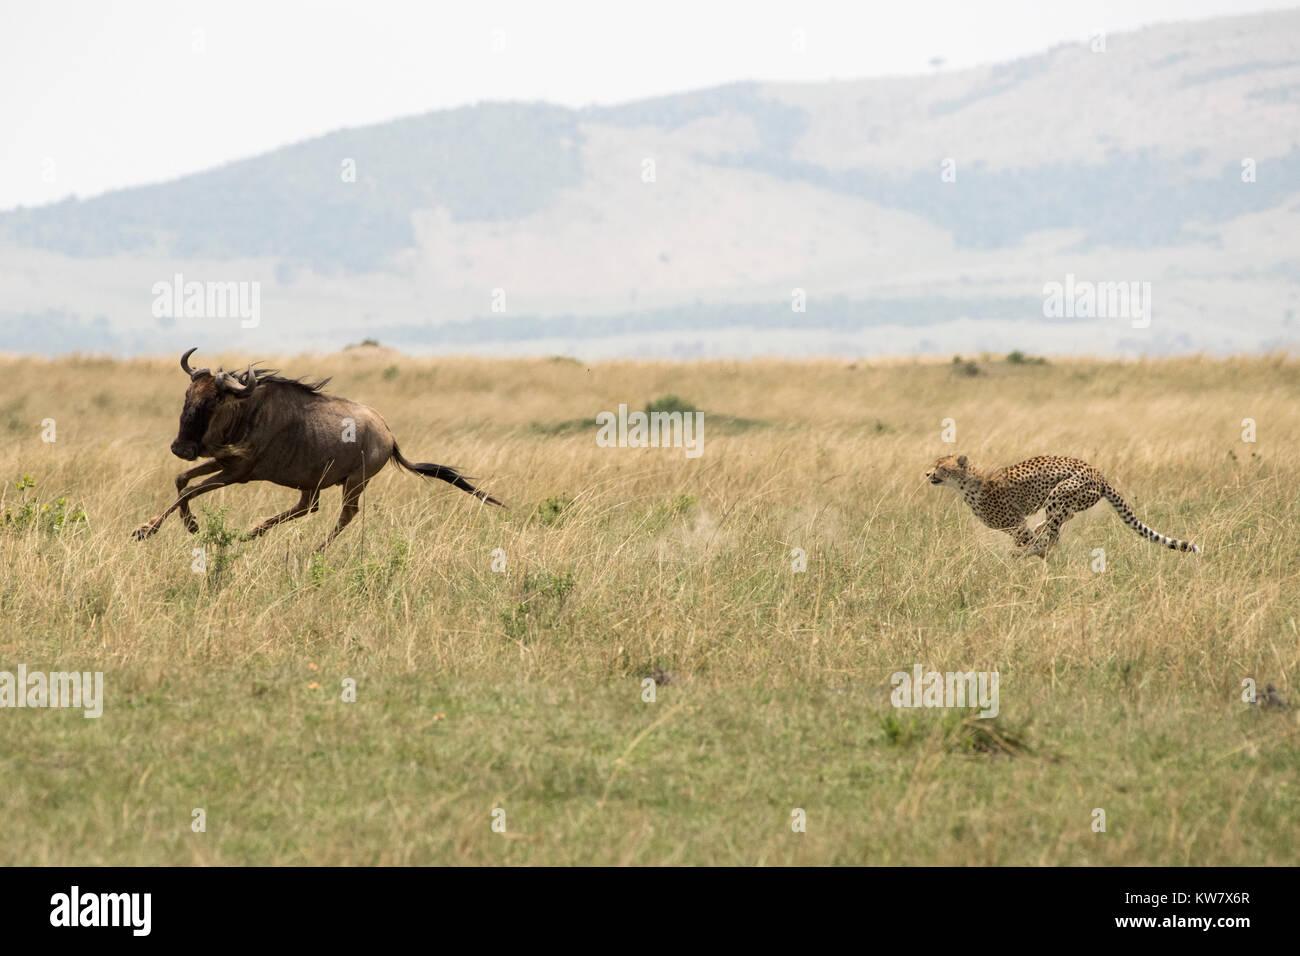 Cheetah (Acinonyx jubatus) chasing a wildebeeste (Gnu,  Connochaetes taurinus) Stock Photo